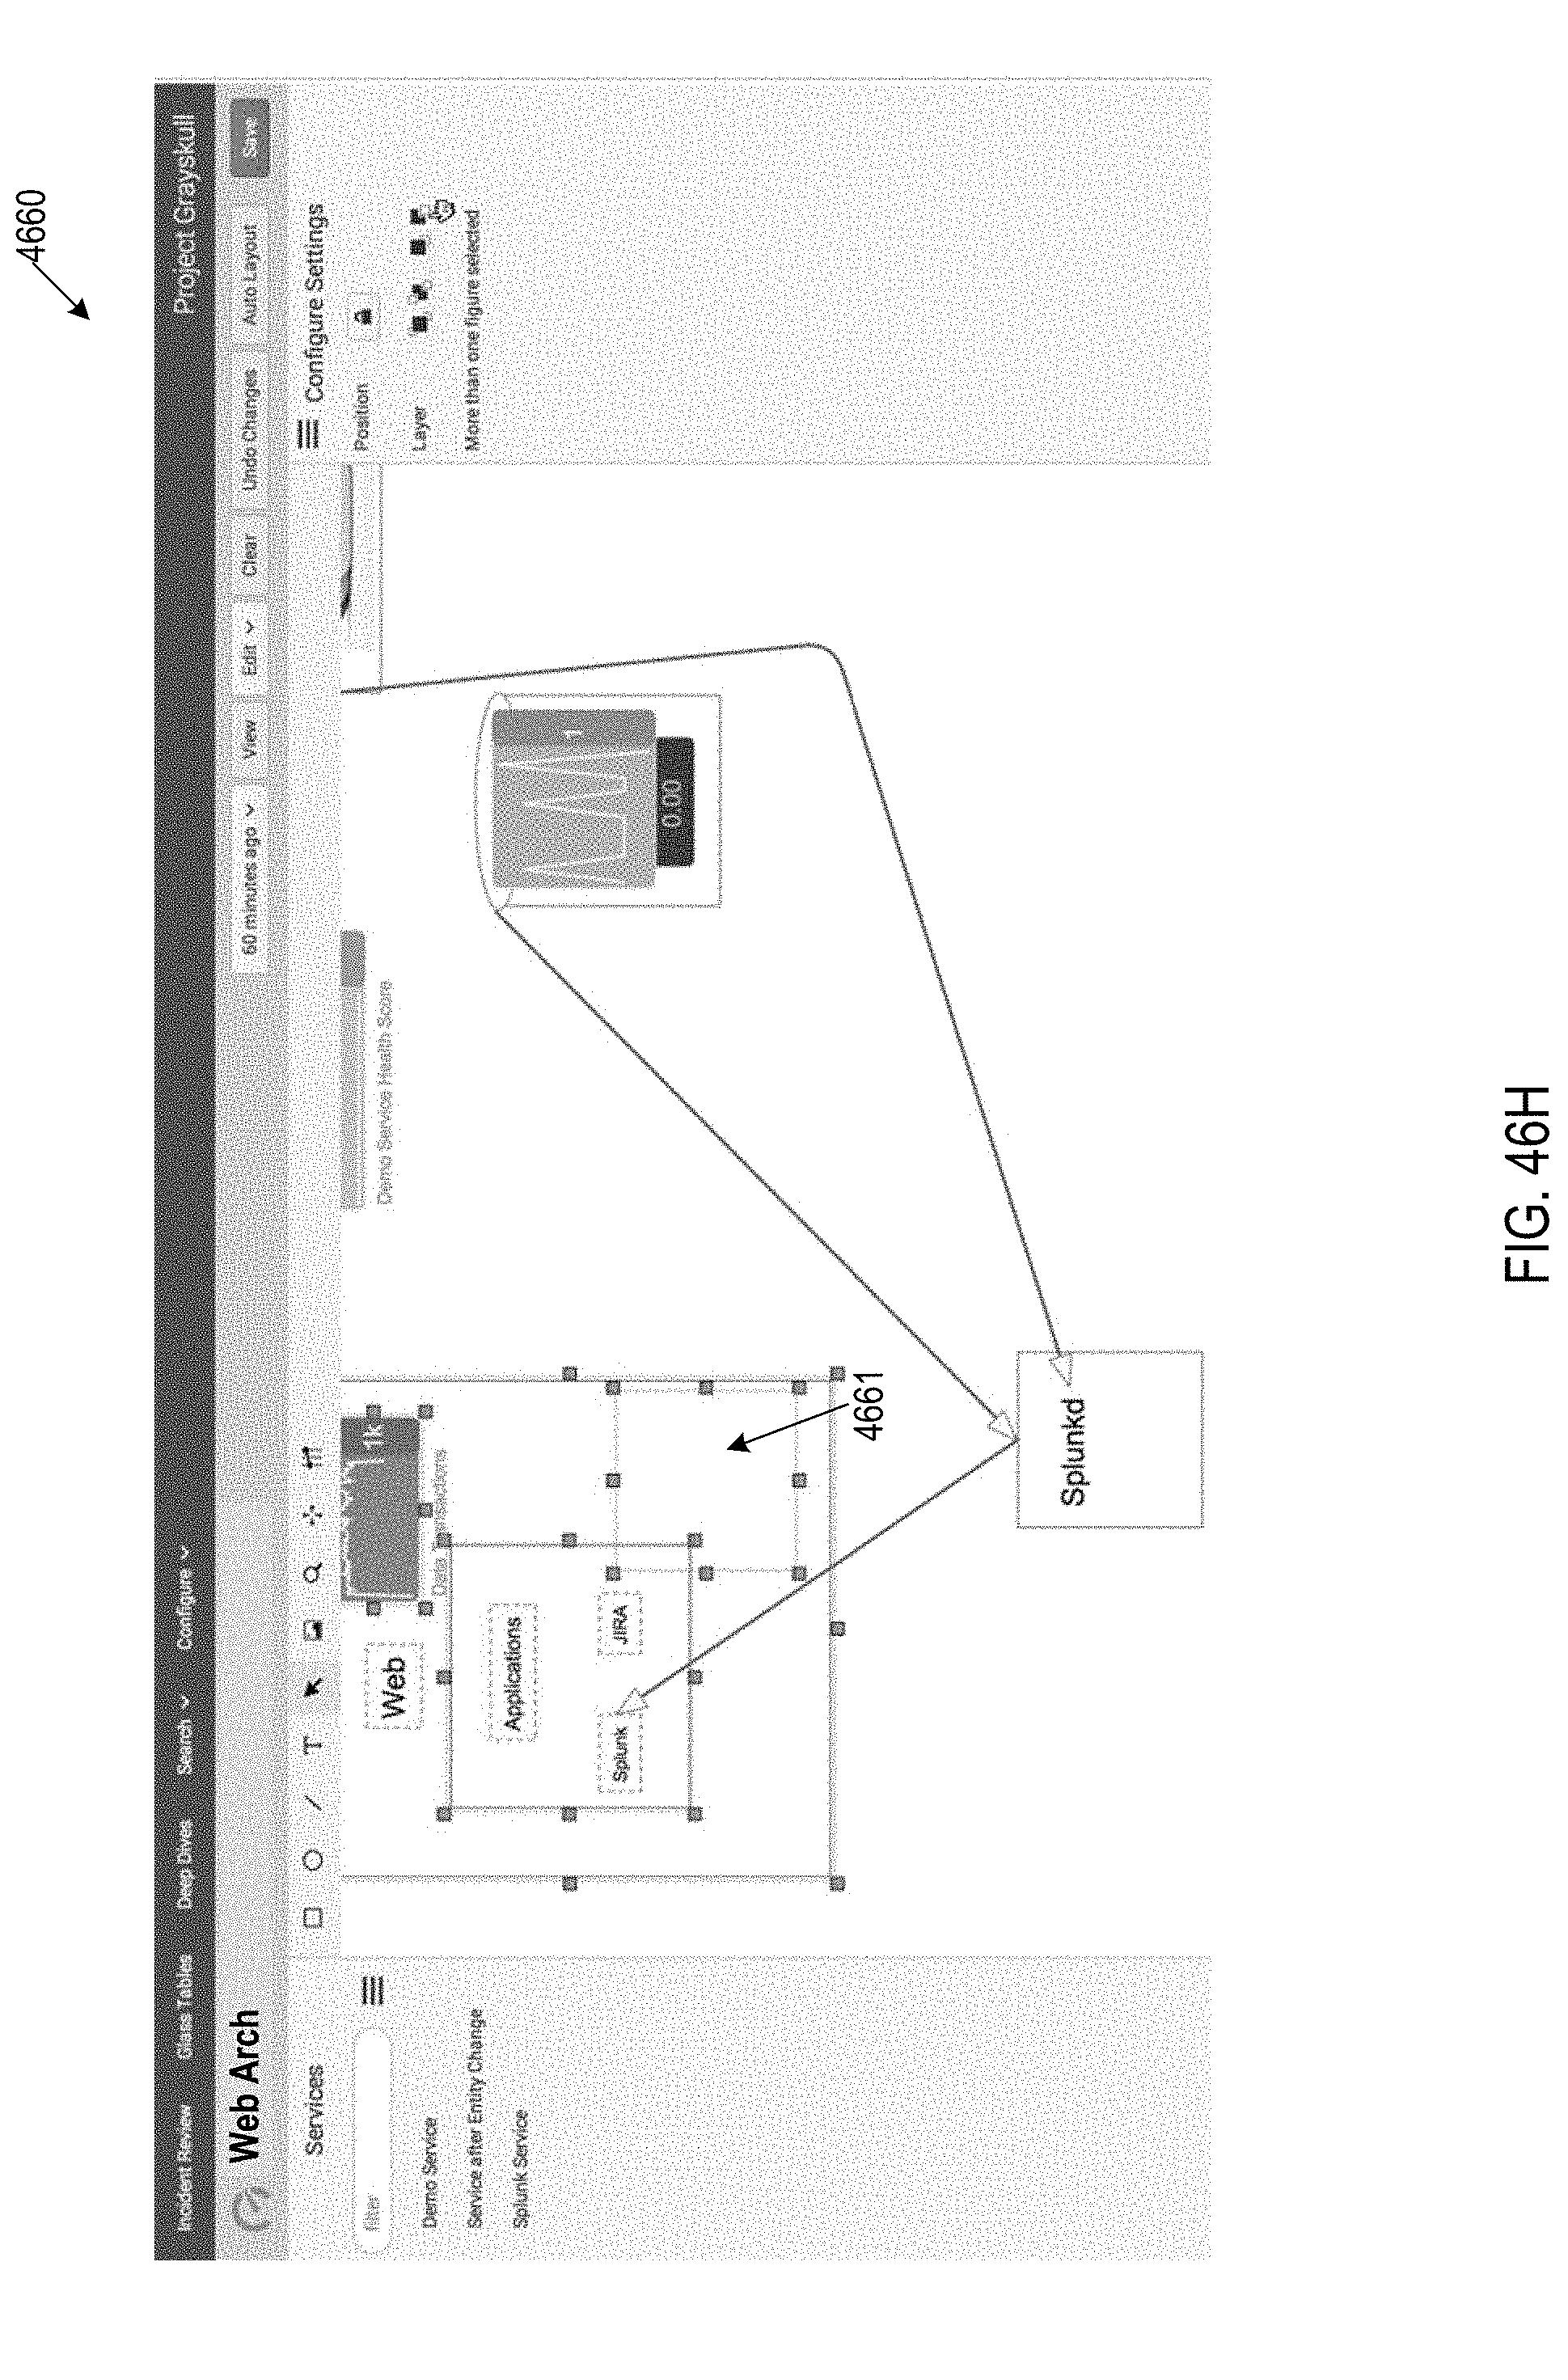 Patent US 9,960,970 B2